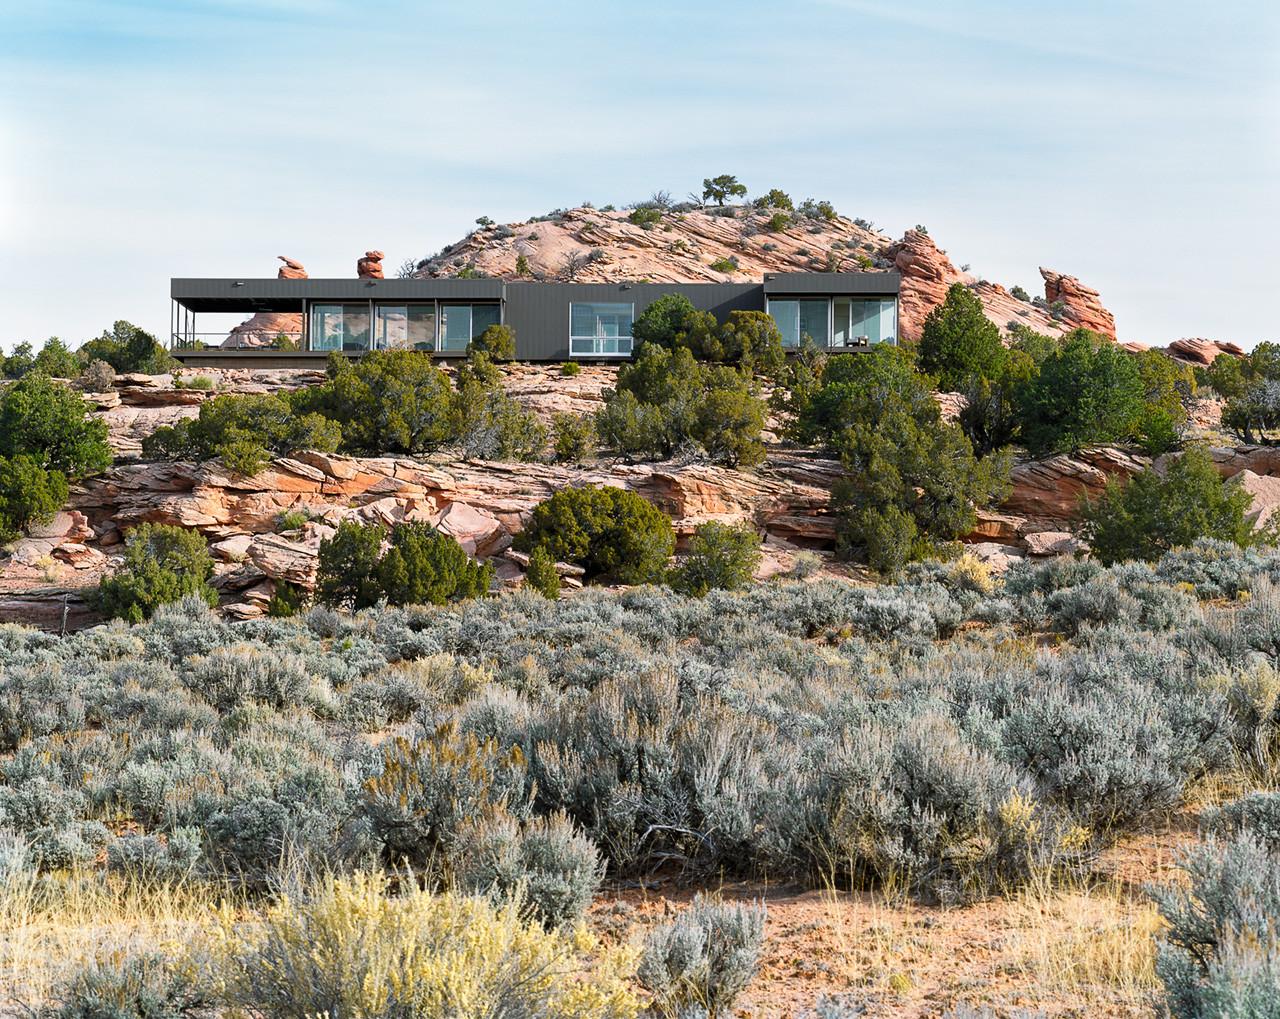 Gallery of hidden valley marmol radziner prefab 7 for Utah home design architects